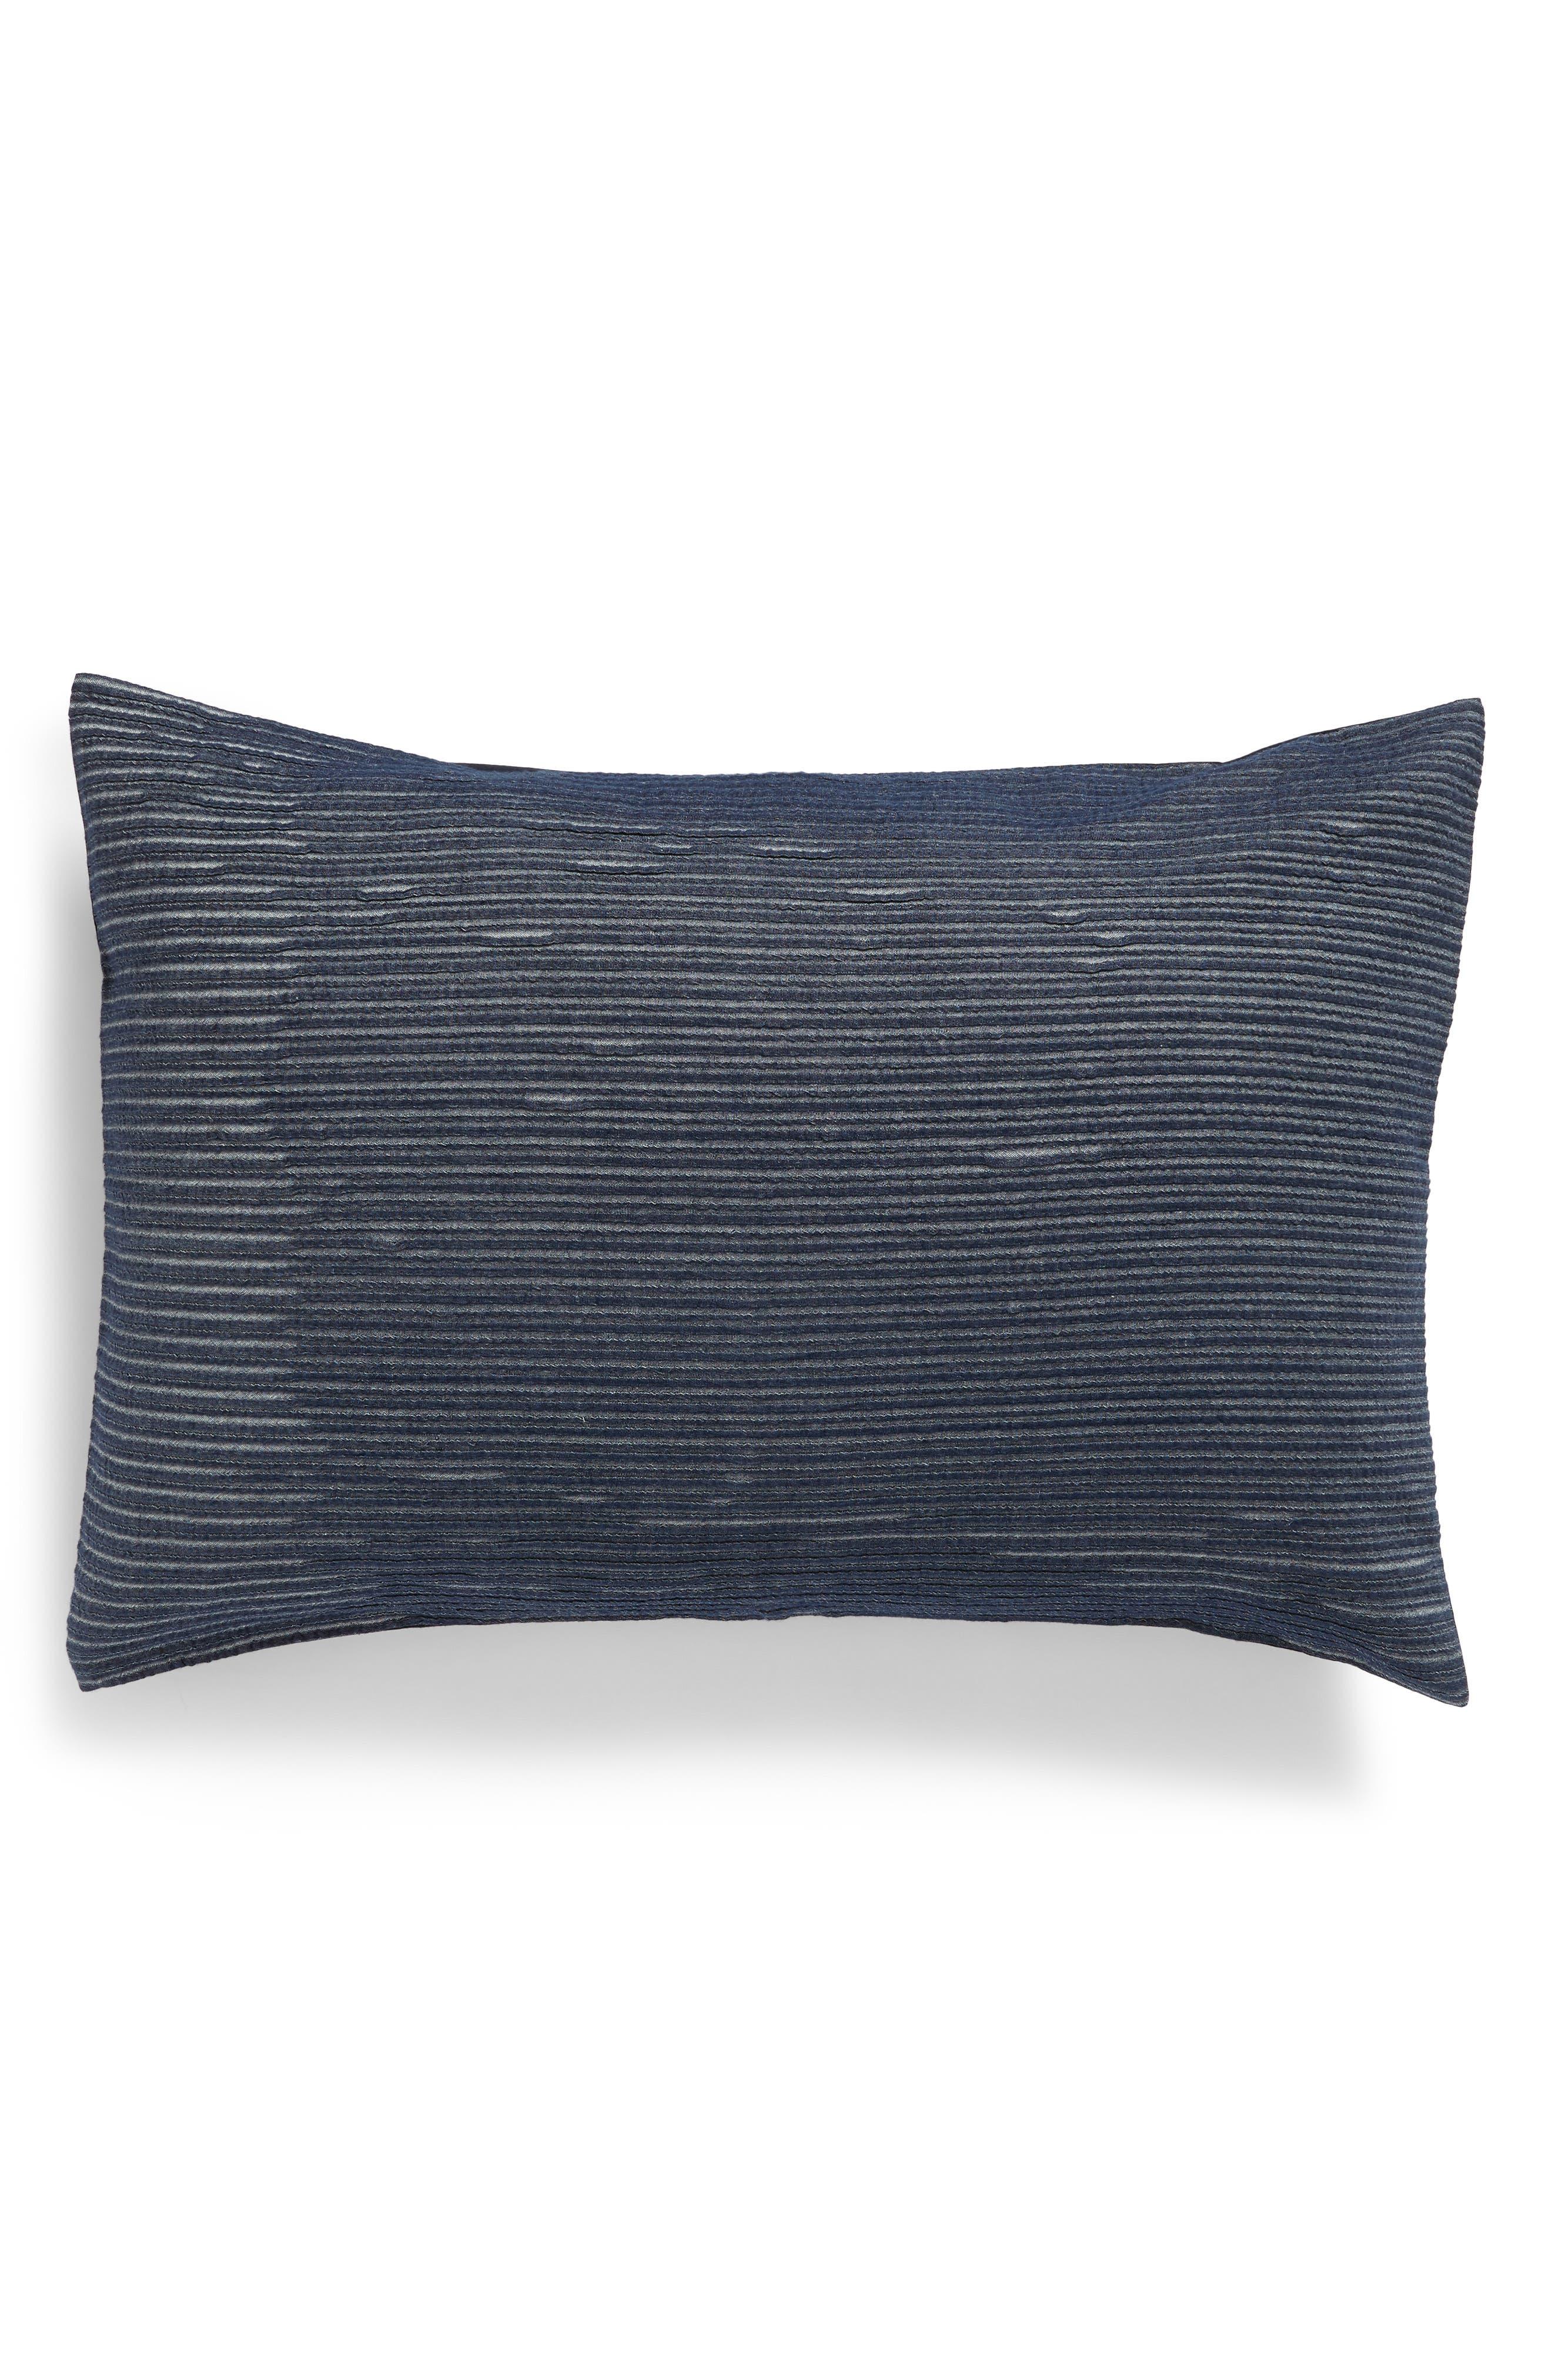 TREASURE & BOND, Stripe Texture Sham, Main thumbnail 1, color, NAVY BLUE